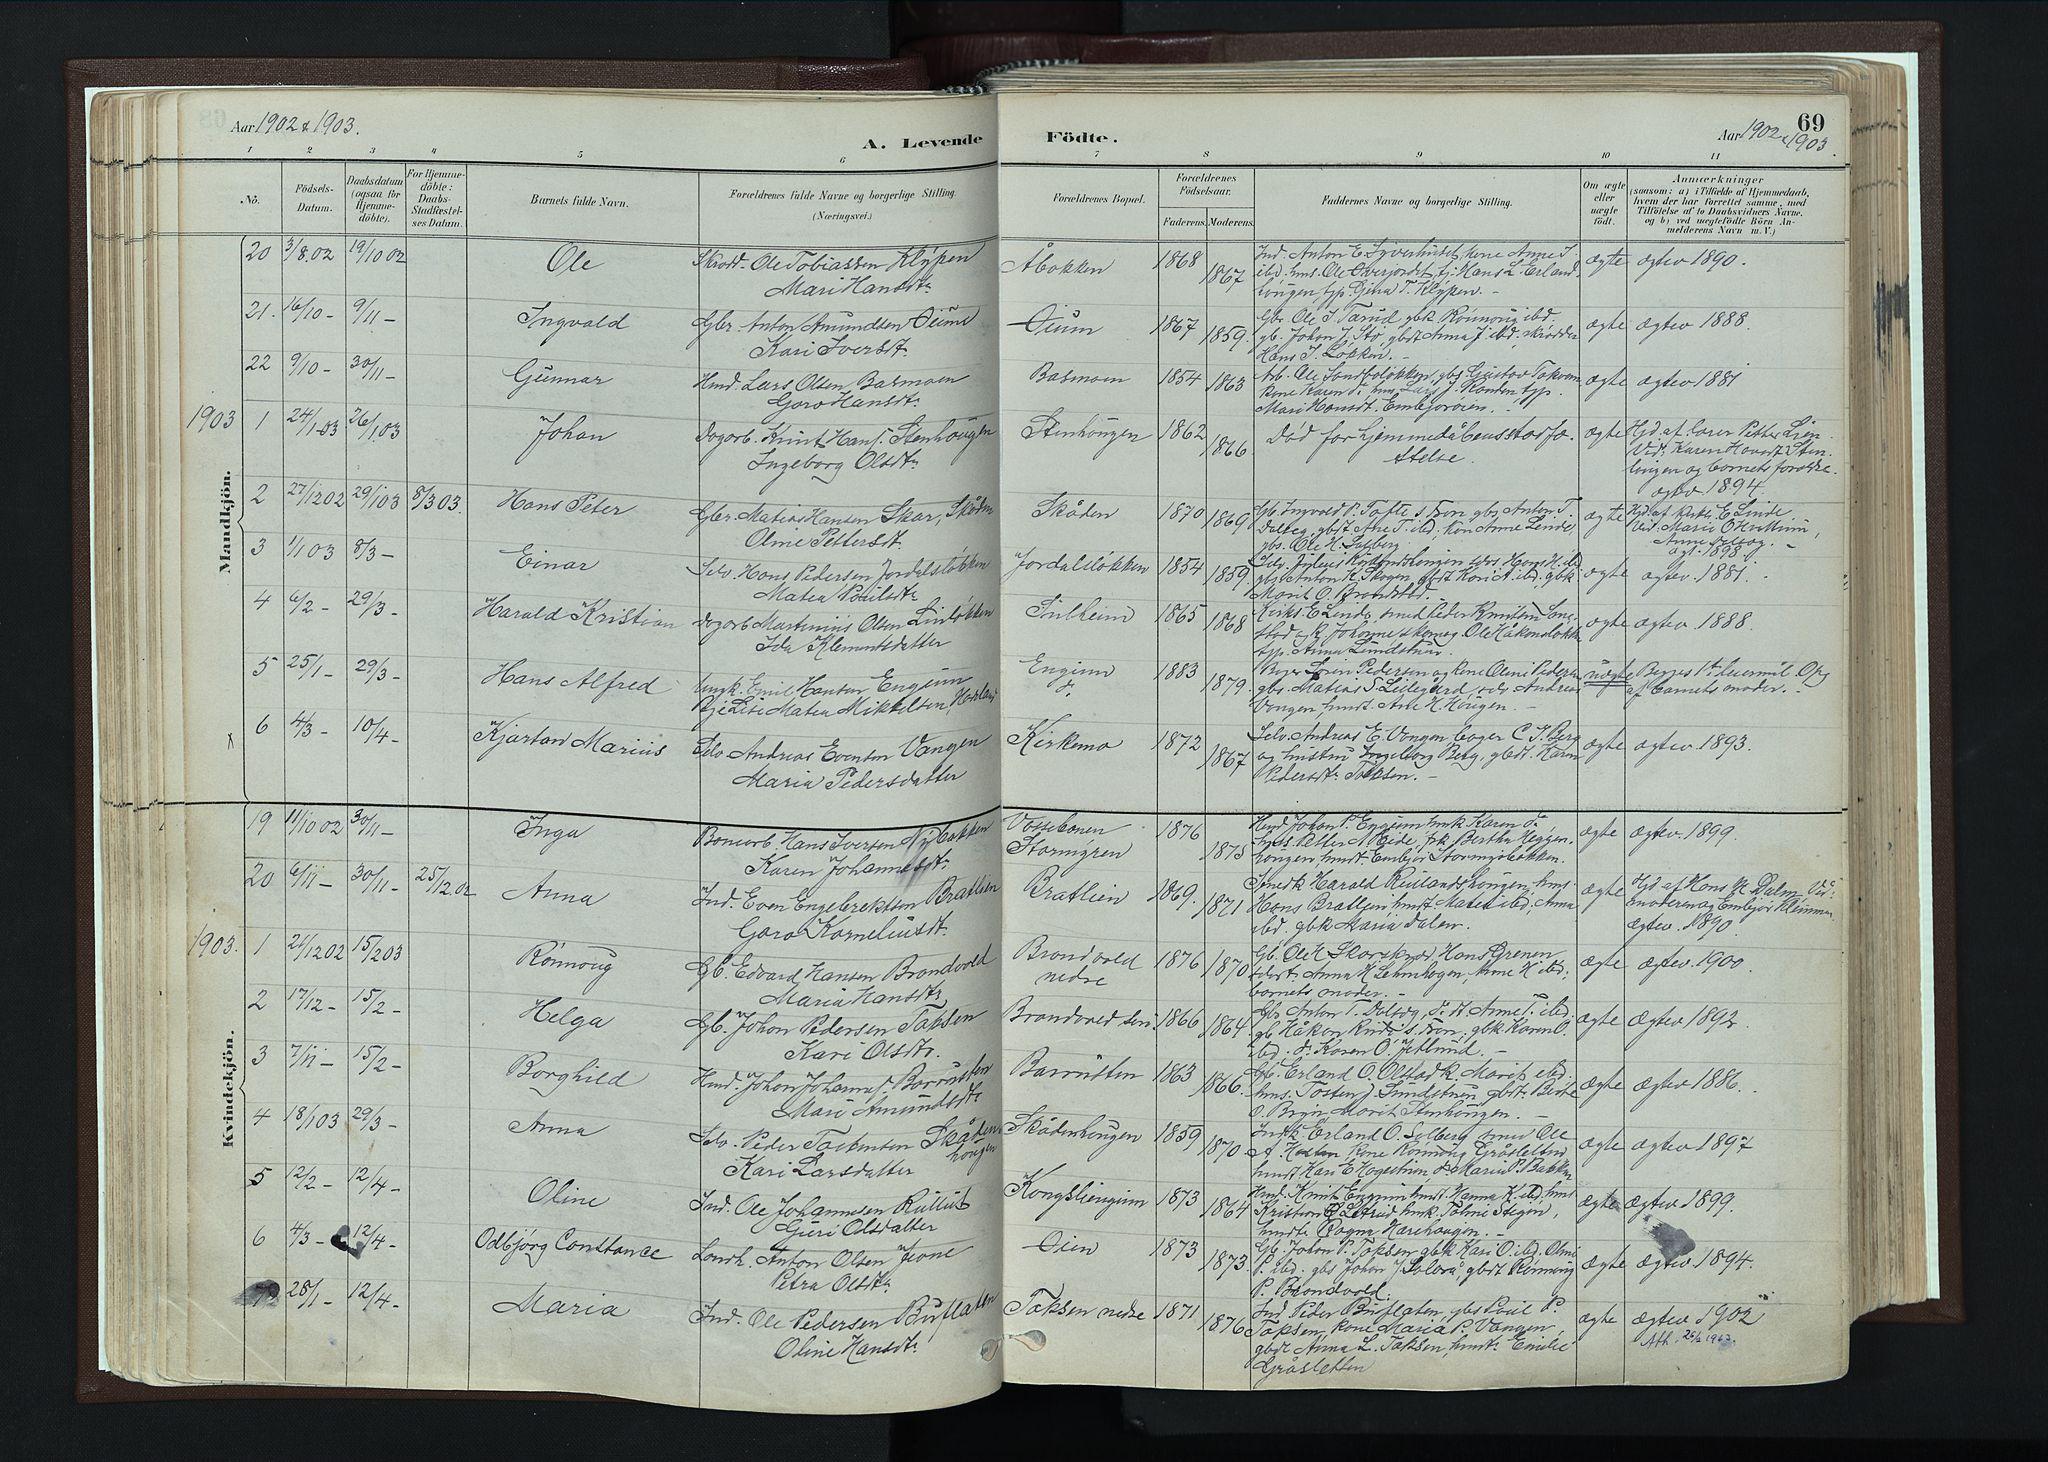 SAH, Nord-Fron prestekontor, Ministerialbok nr. 4, 1884-1914, s. 69